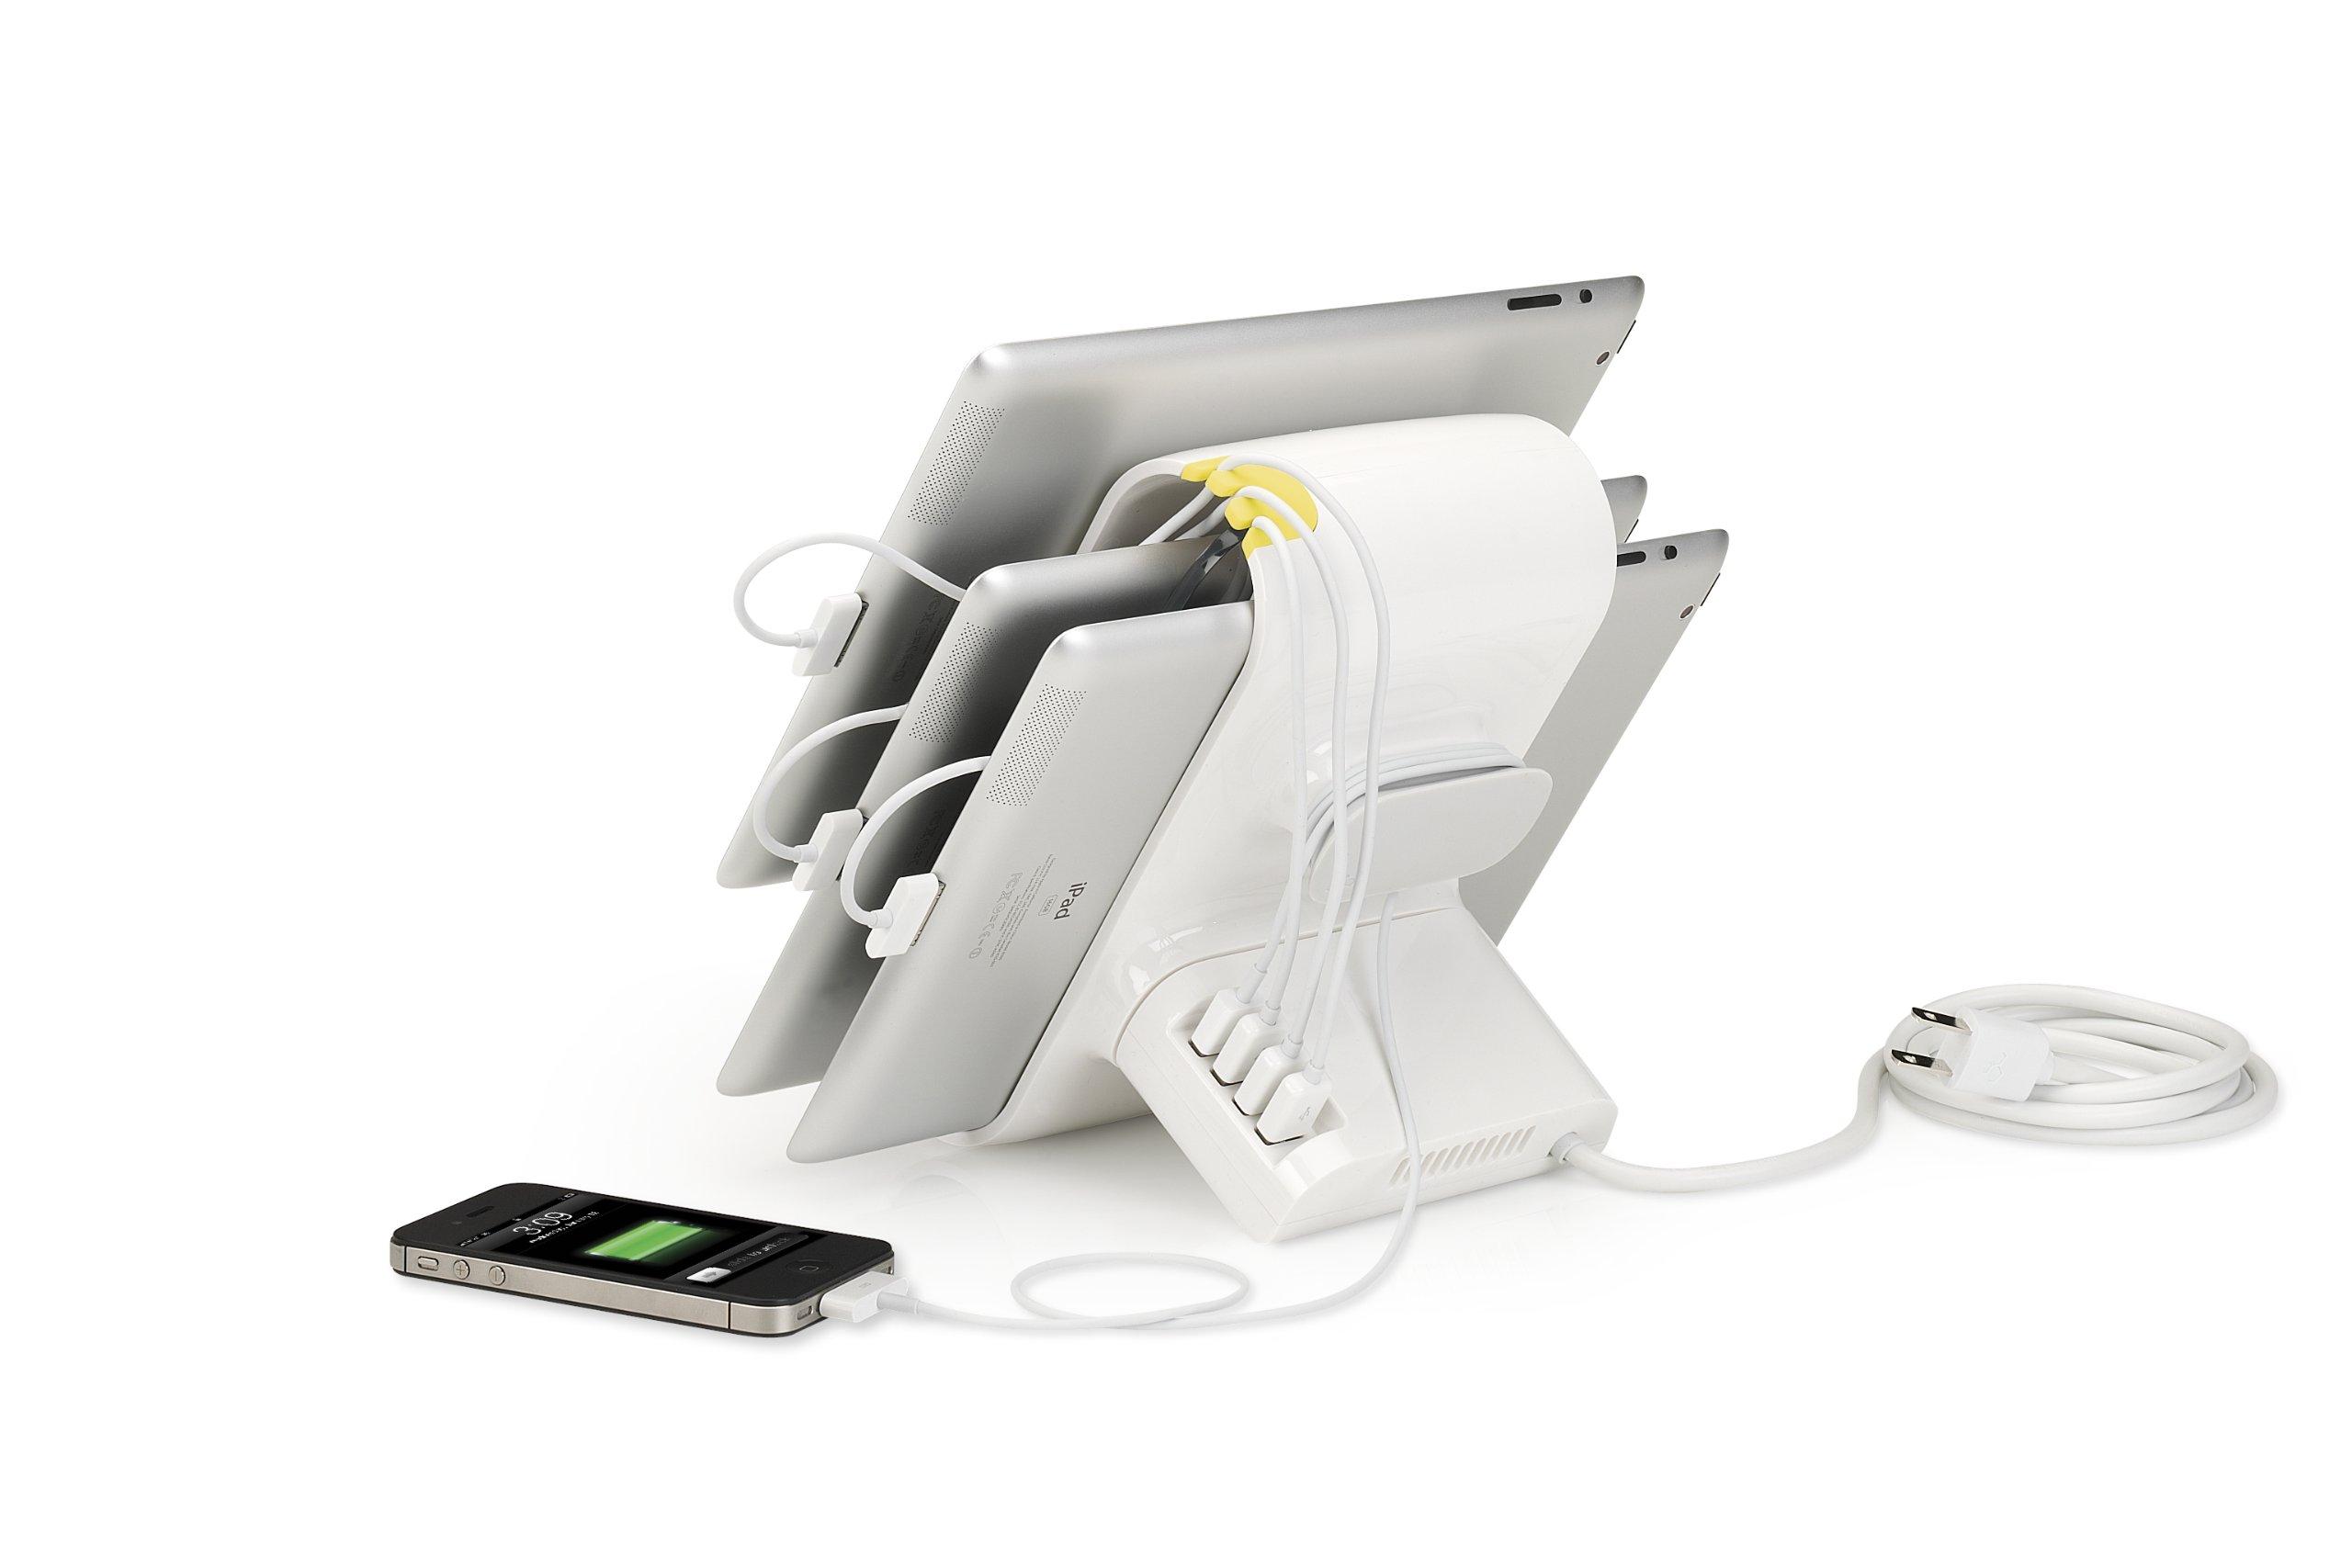 Kanex Sydnee 4-port 2.1A USB Charging Station for iPad, Kindle, Tablets, Smartphones - Snow